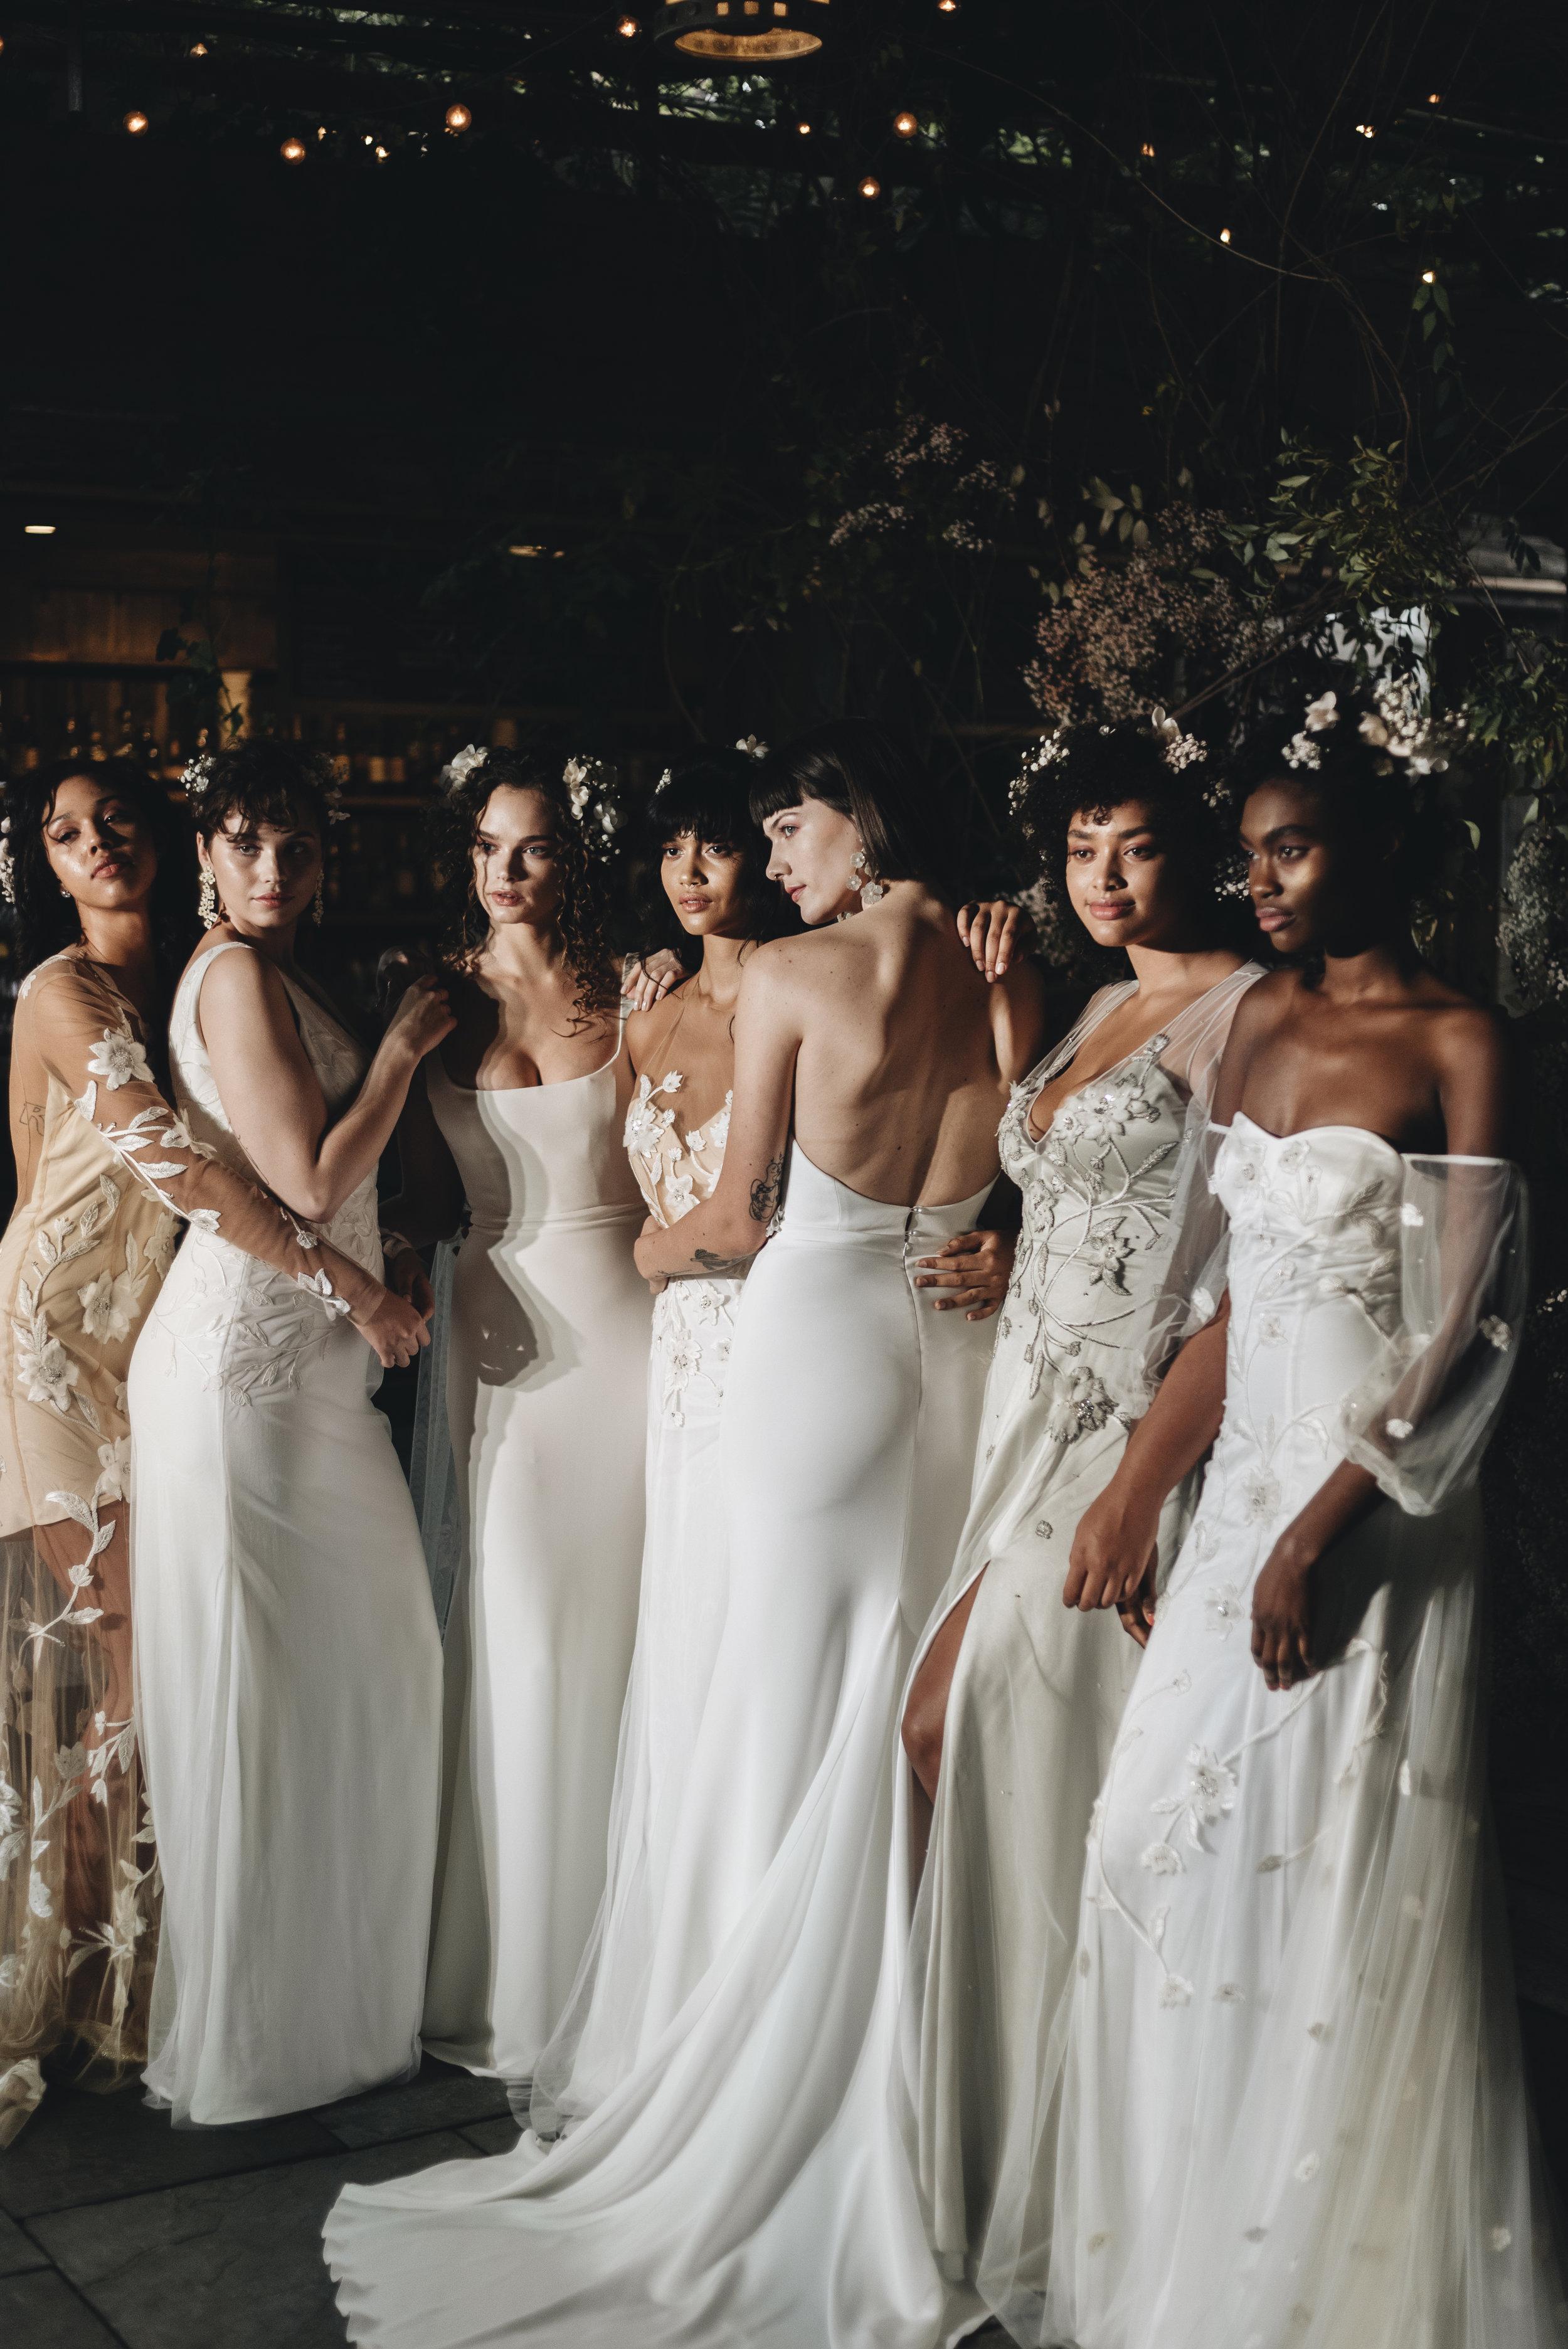 0603ebc380bc Minneapolis, MN Wedding Dress Trunk Shows and Events a&bé bridal shop